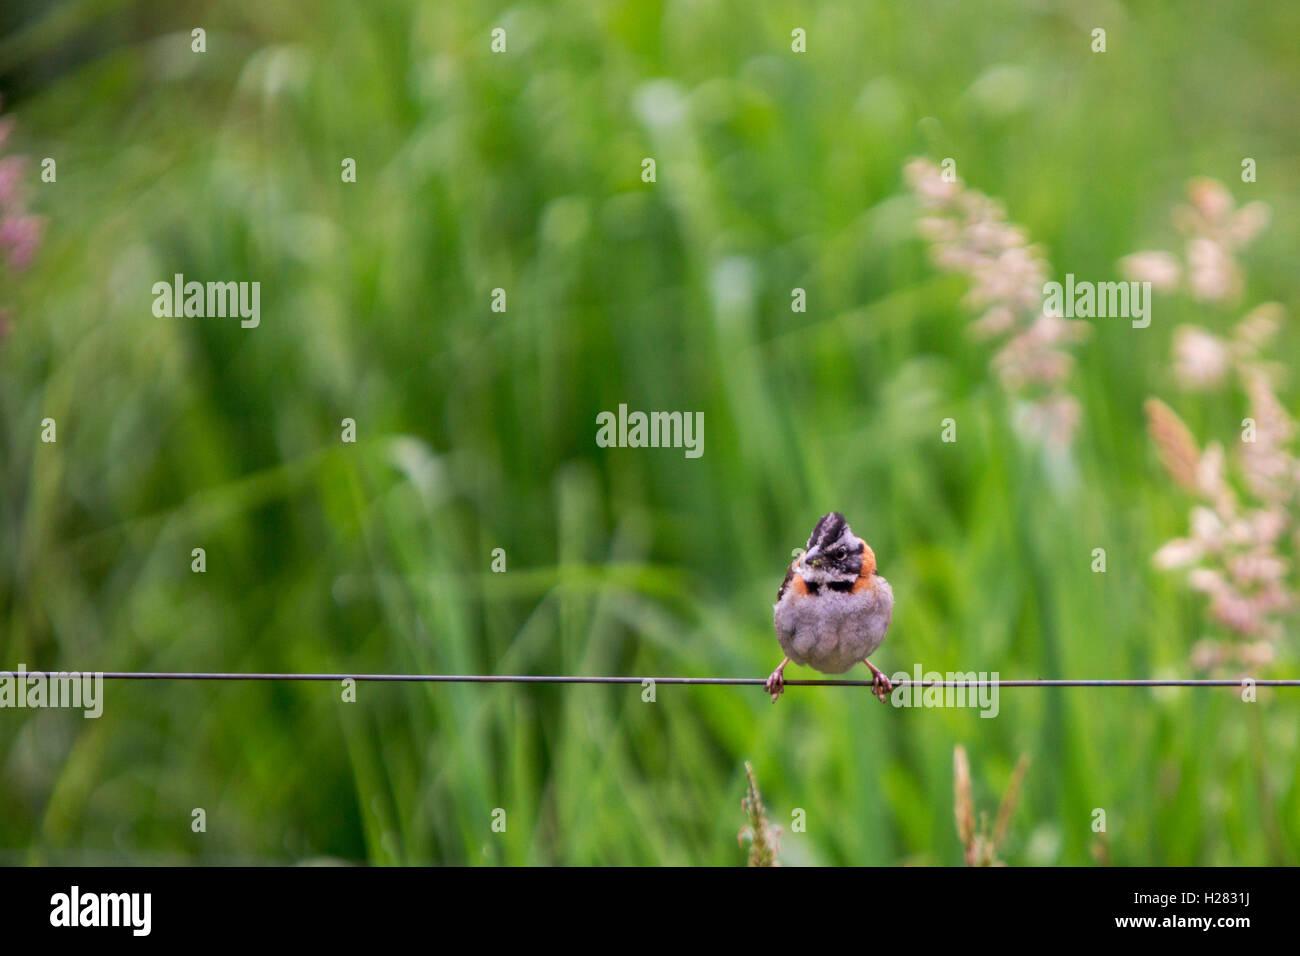 tiny bird on a wire Stock Photo